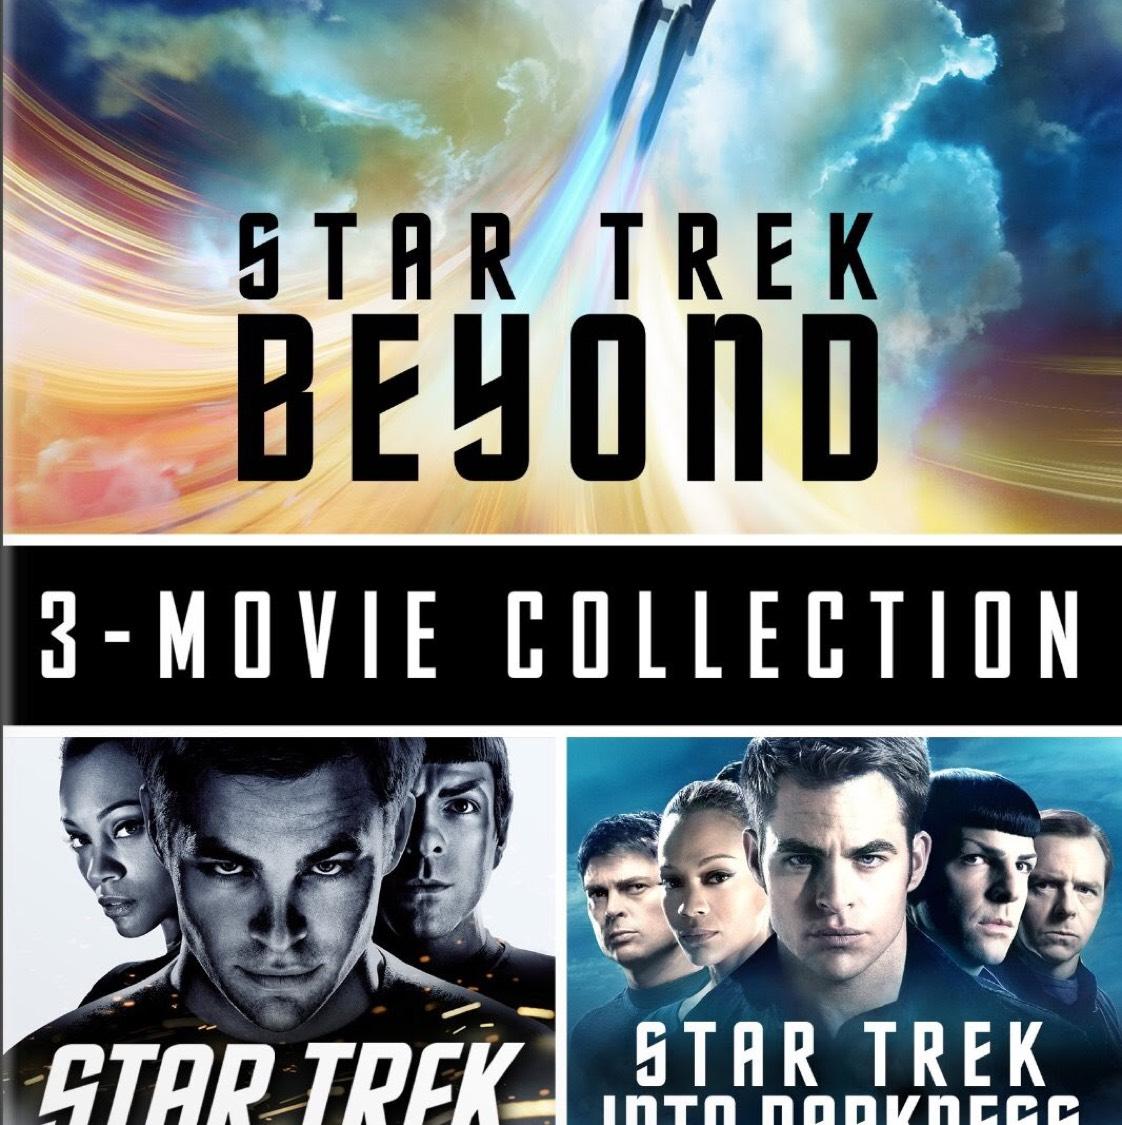 Star Trek 3-Movie collection (2 in 4K, 1 in HD) on iTunes - £14.99